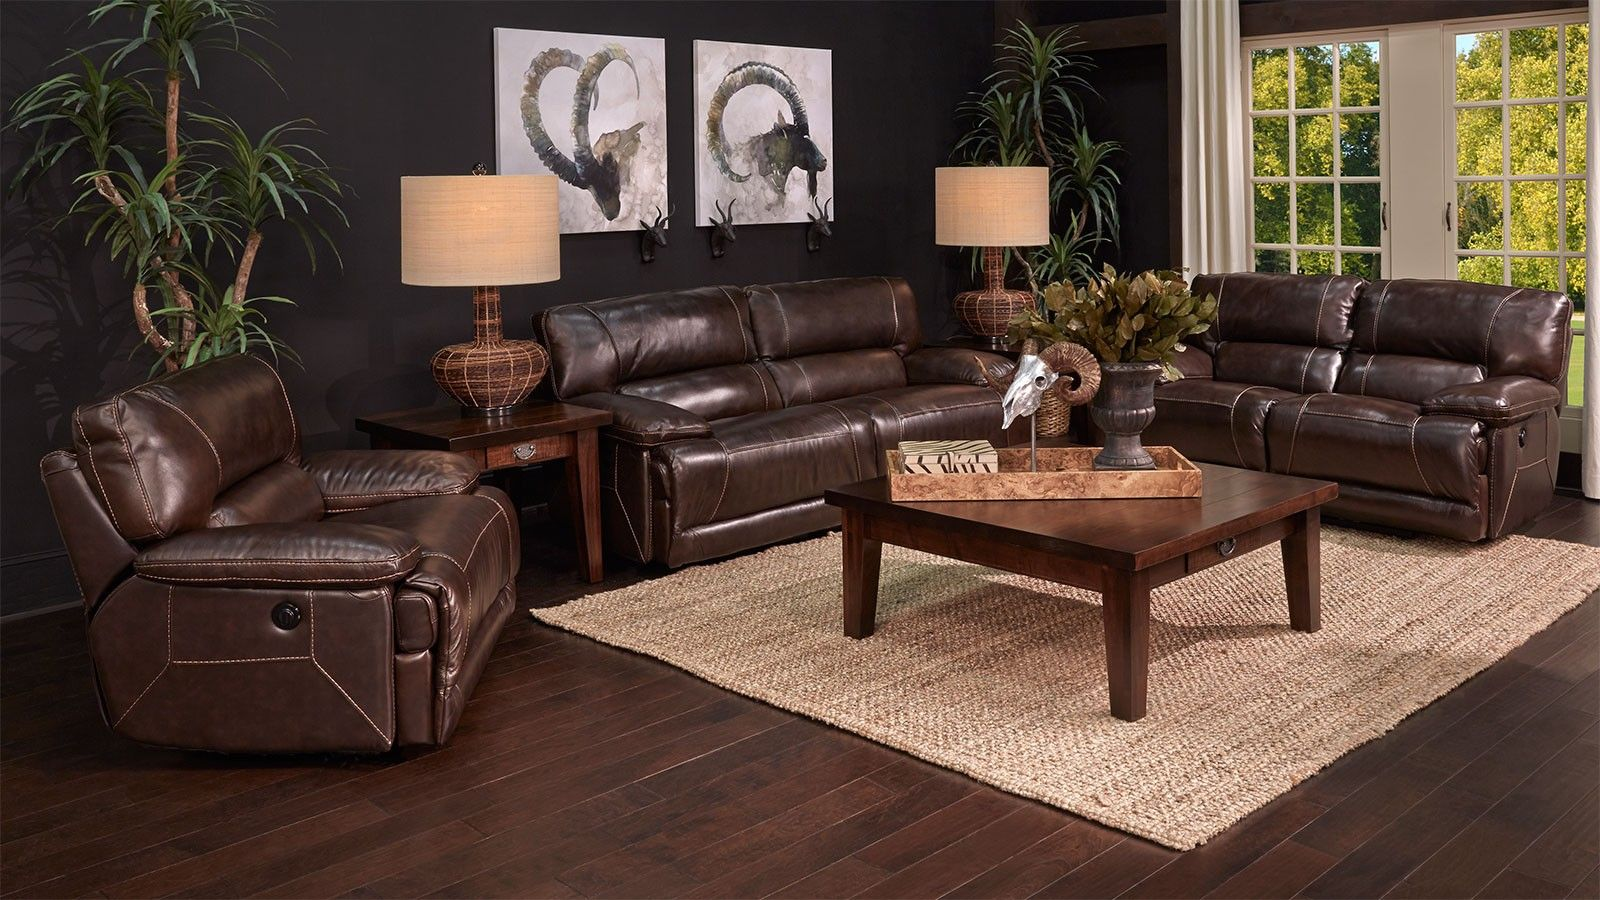 Impala Fleet Street Power Living Room Collection Furniture Living Room Furniture Room #power #living #room #sets